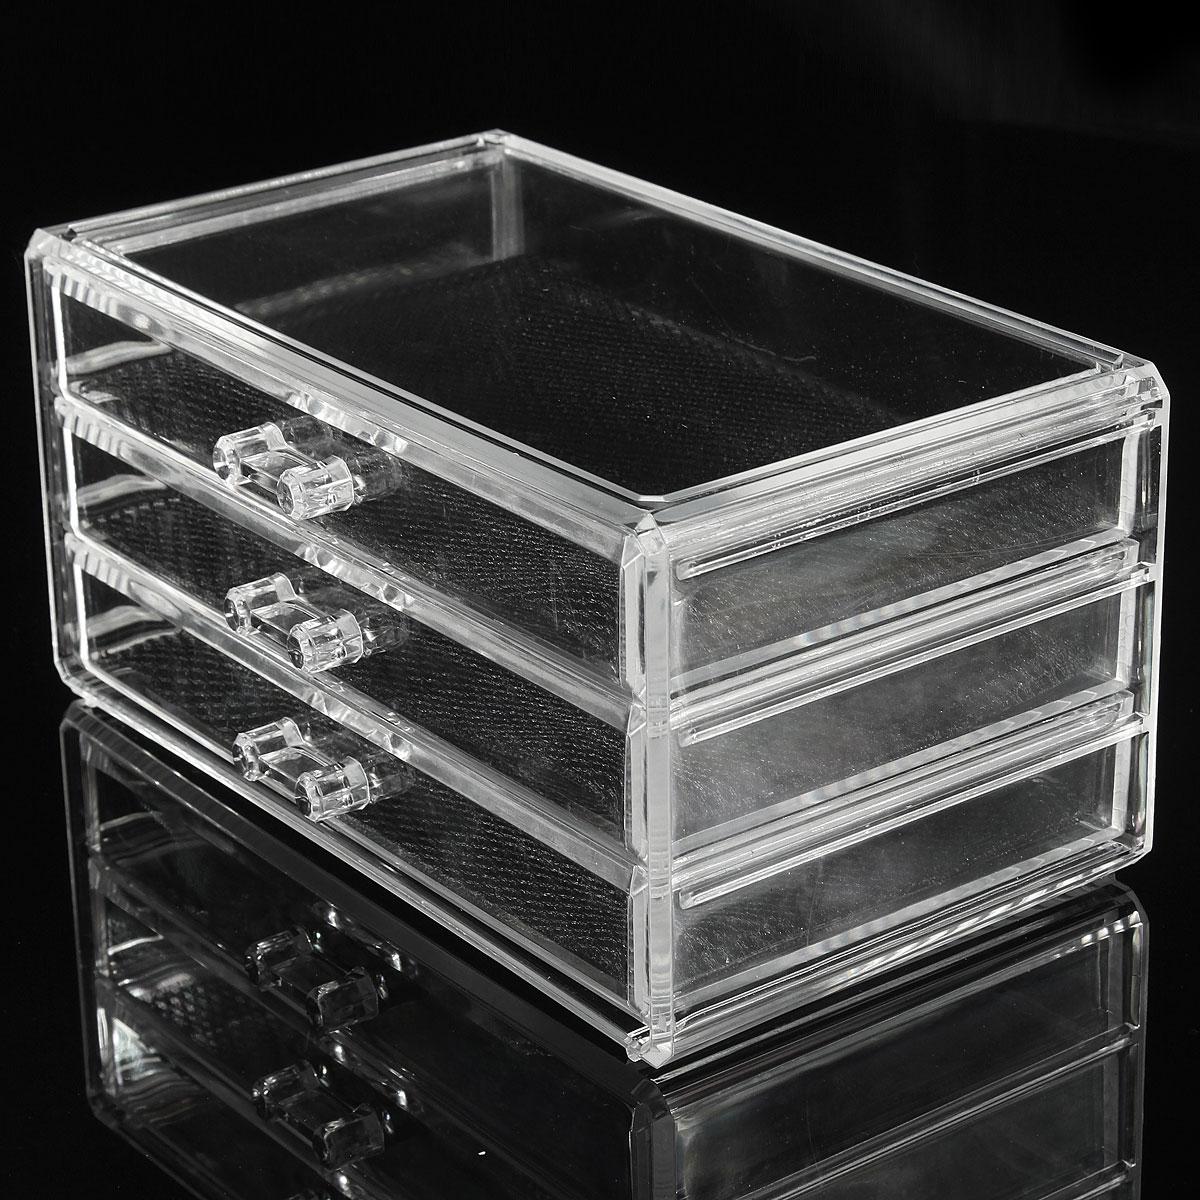 Clear acrylic cosmetic jewelry makeup organizer box case 3 Makeup drawer organizer